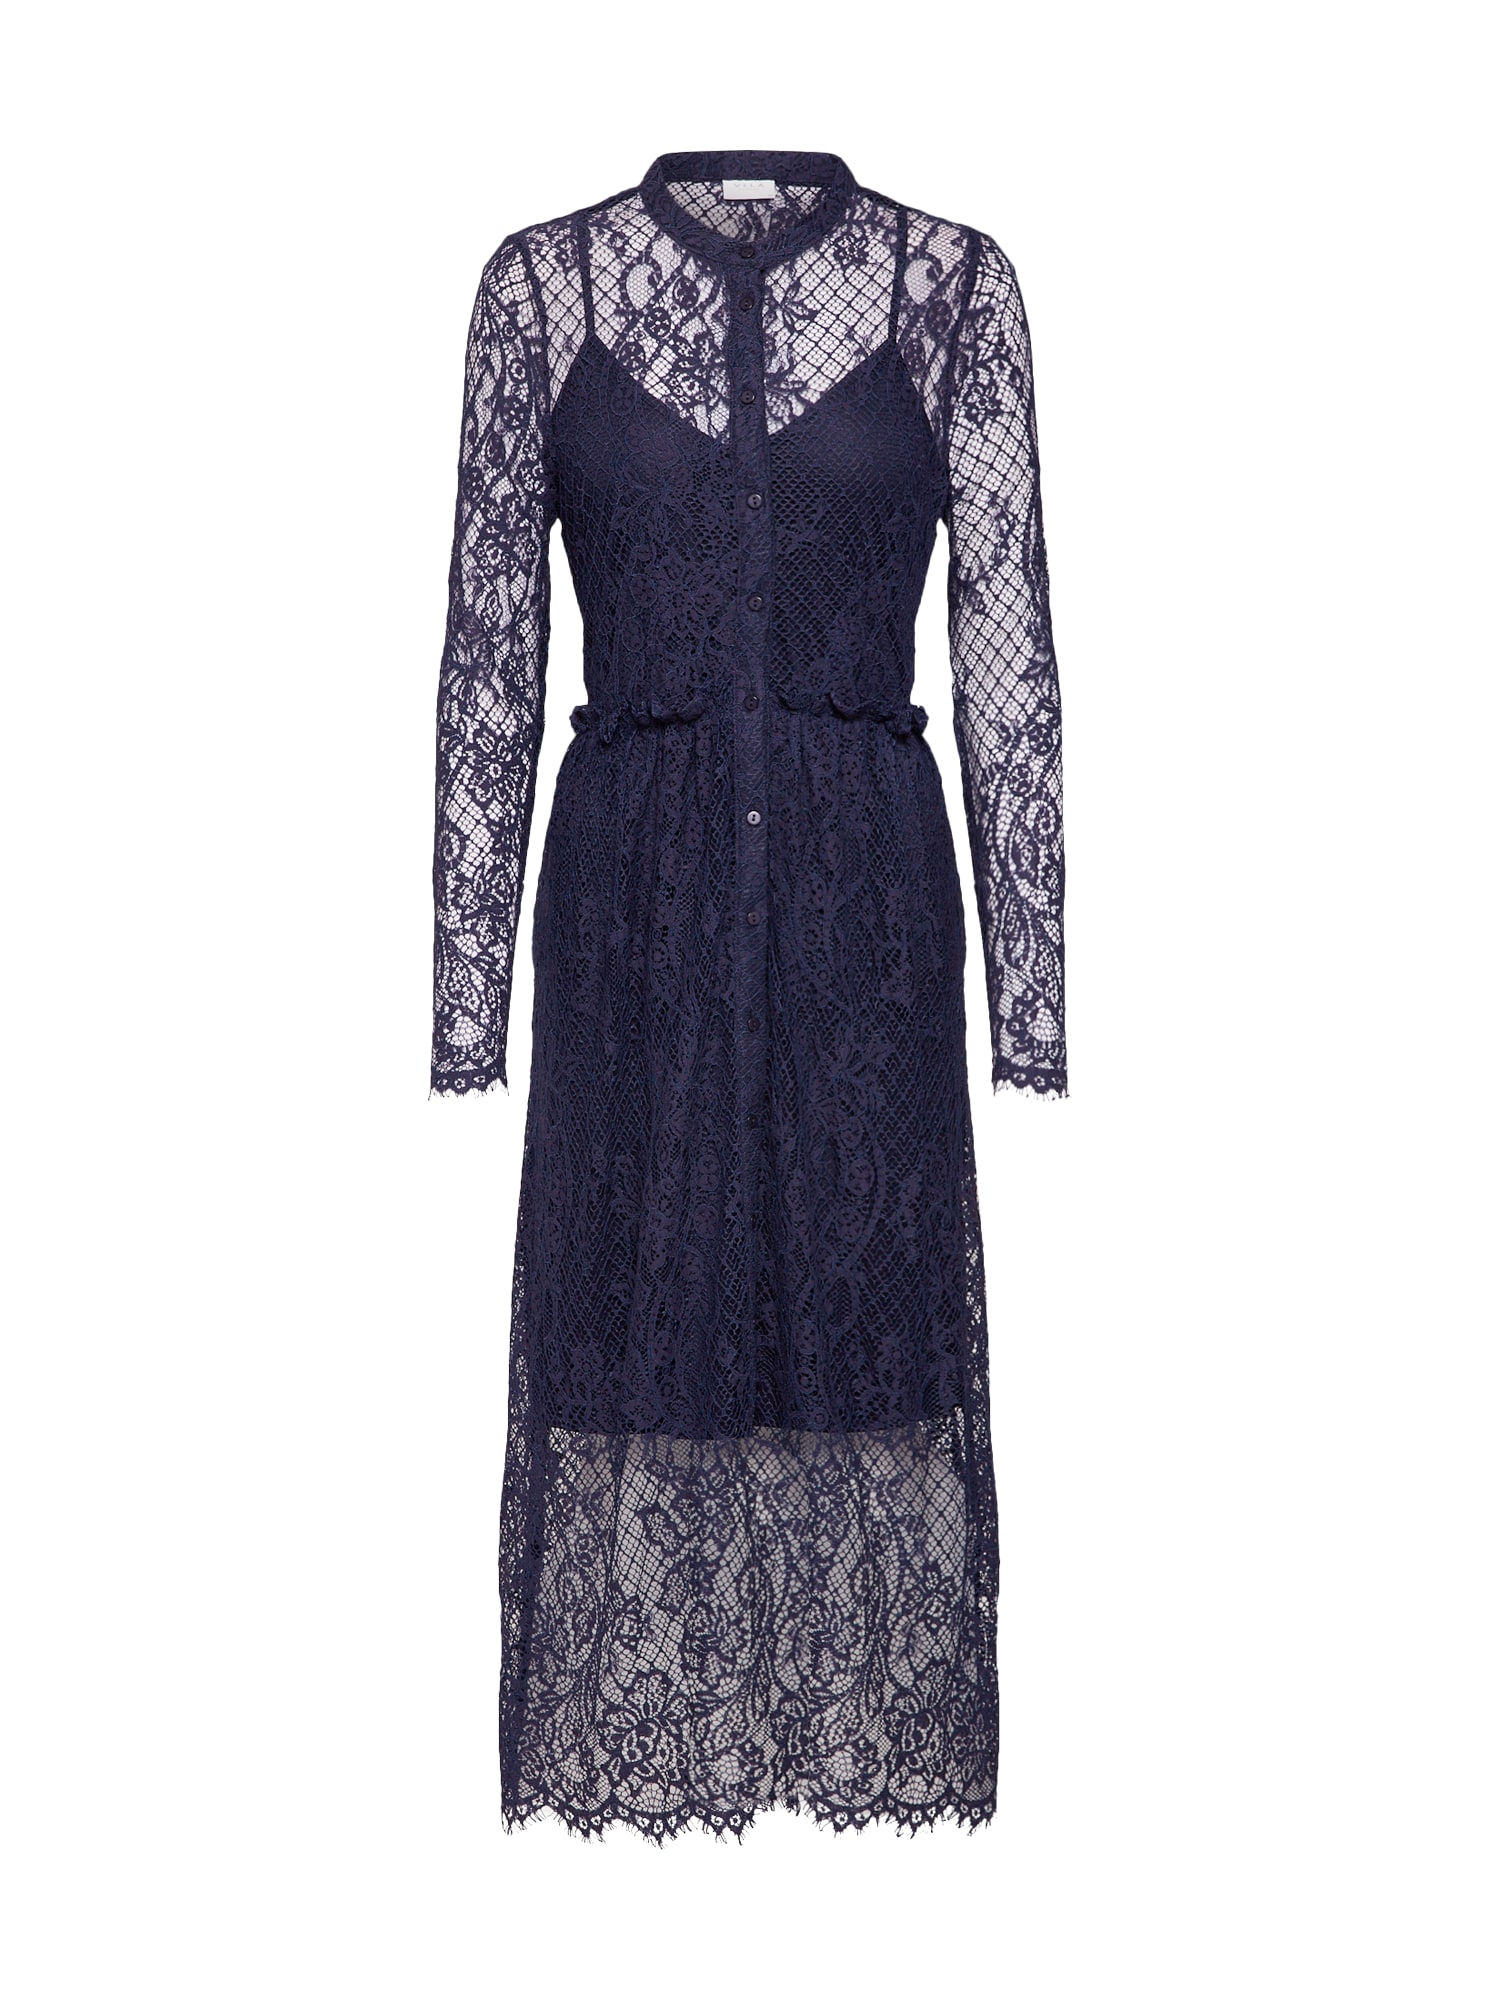 Šaty VILIVIAS námořnická modř VILA